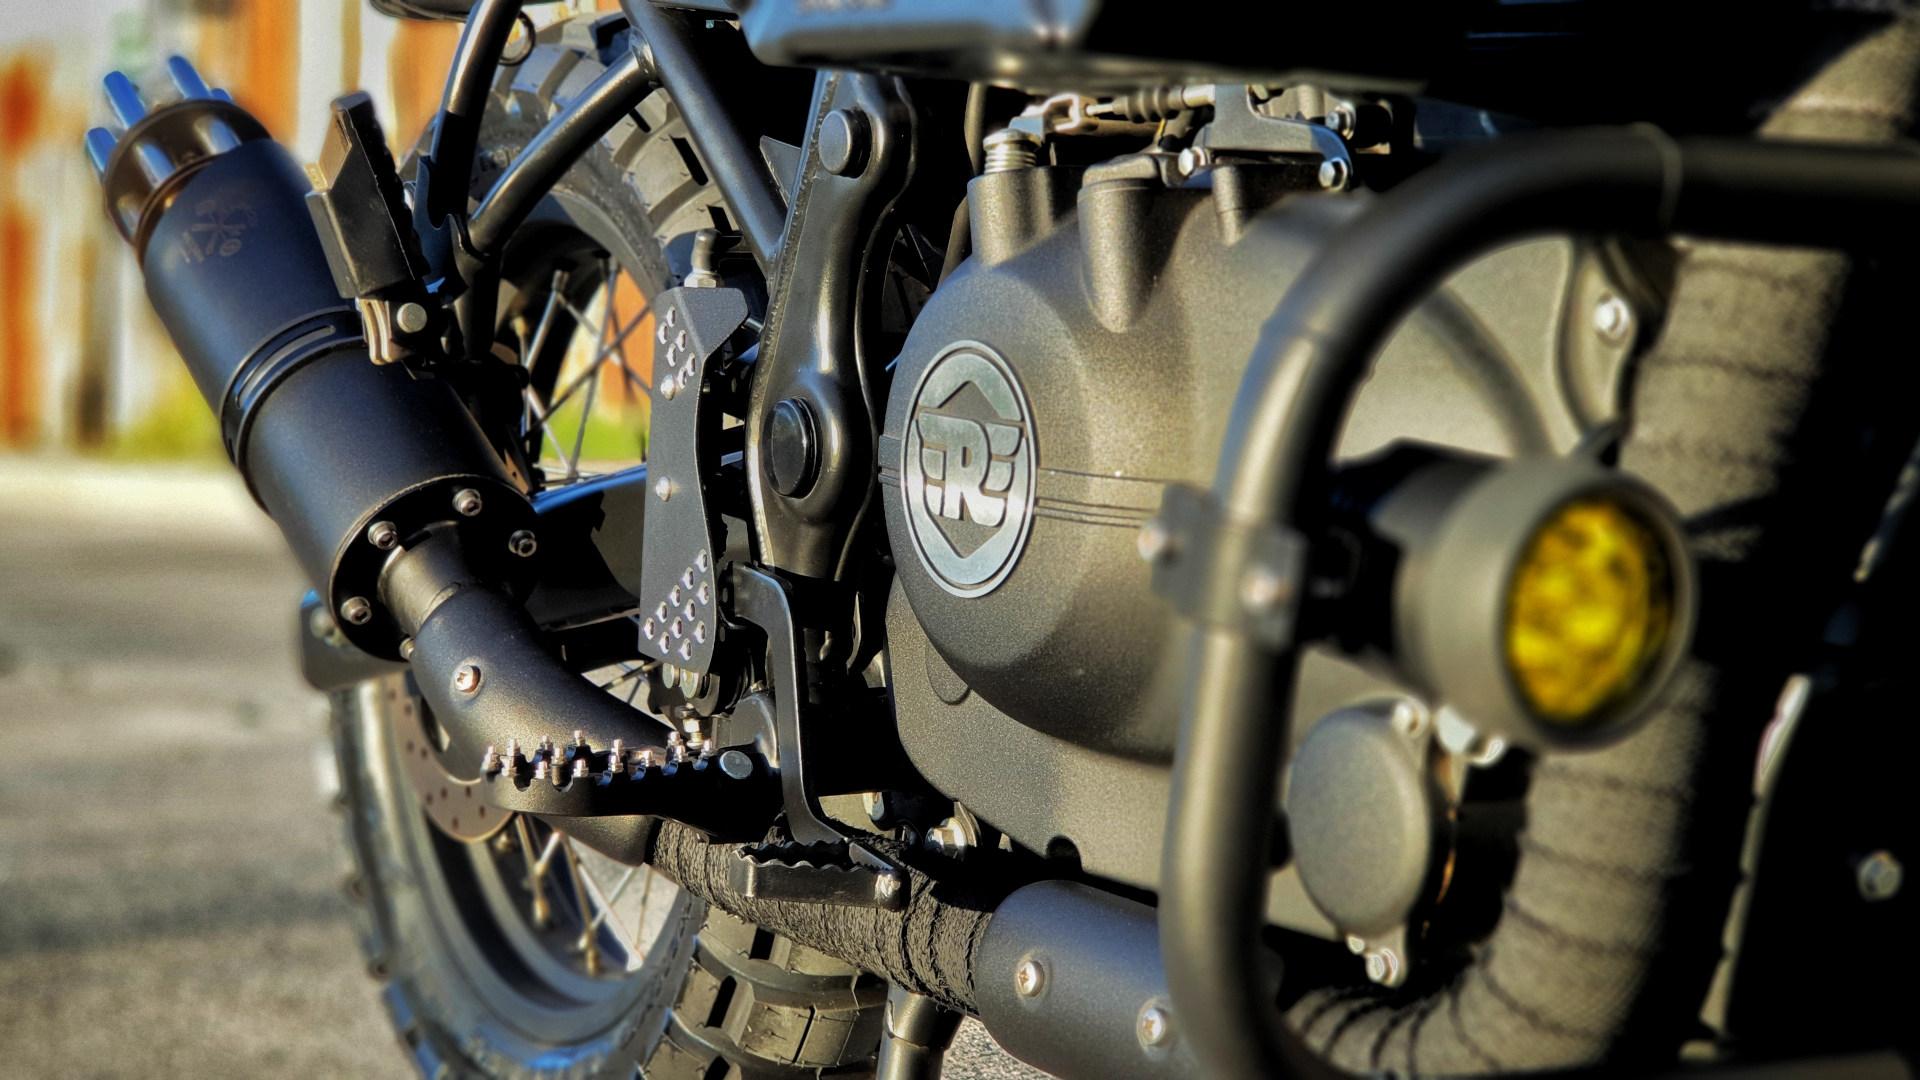 Iron Macchina Customs' Royal Enfield Himalayan engine and exhaust